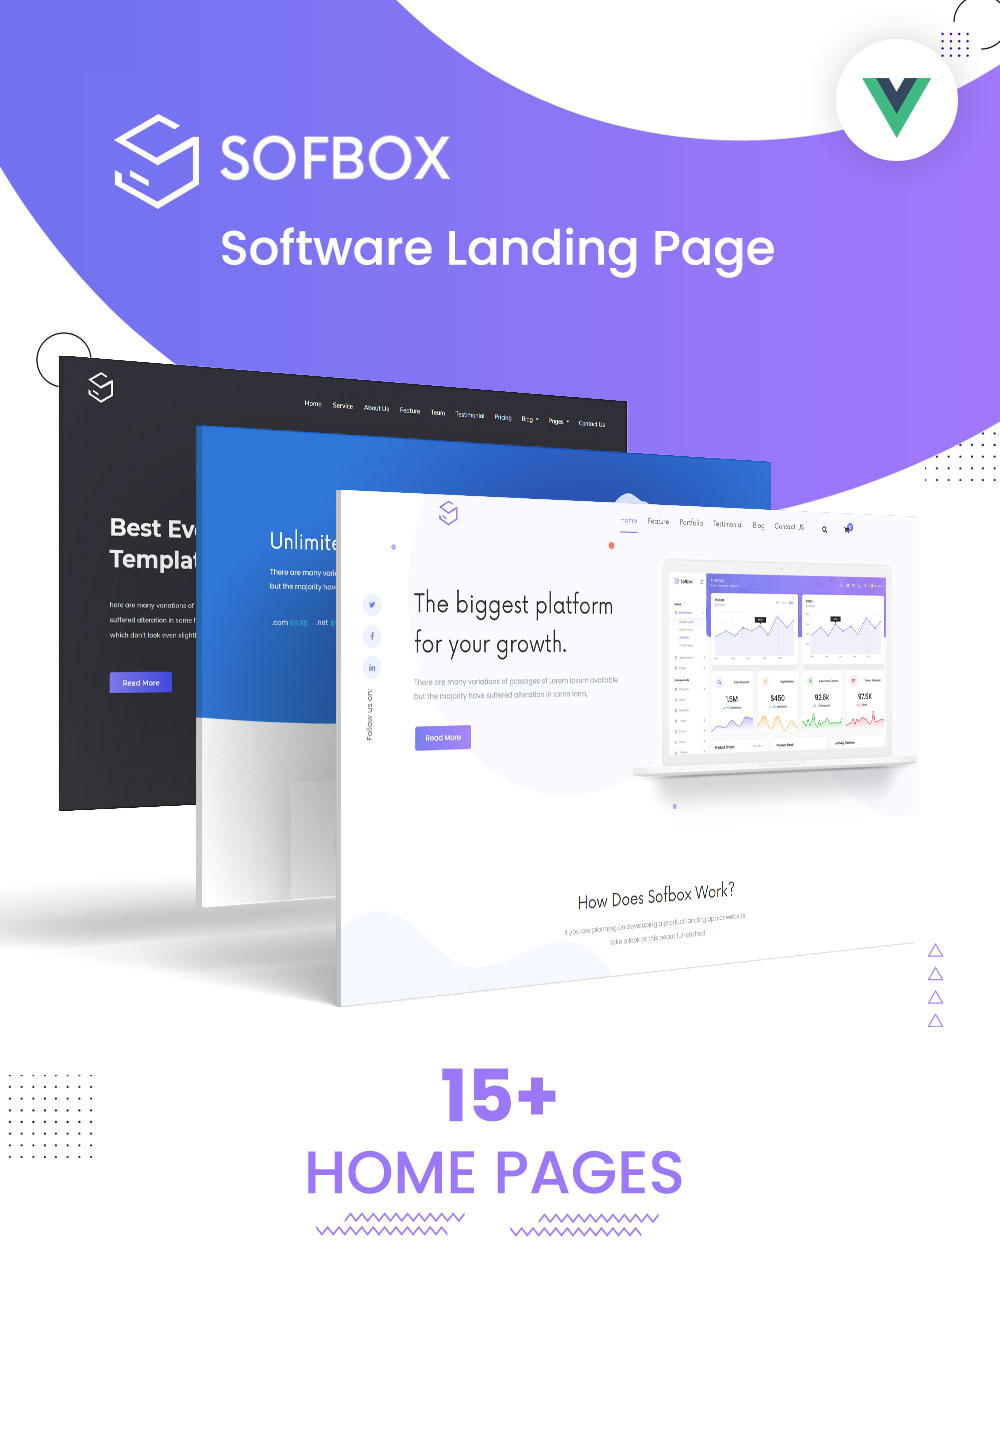 Sofbox - Vue JS Software Landing Page - 1 vue js software landing page Sofbox vue js